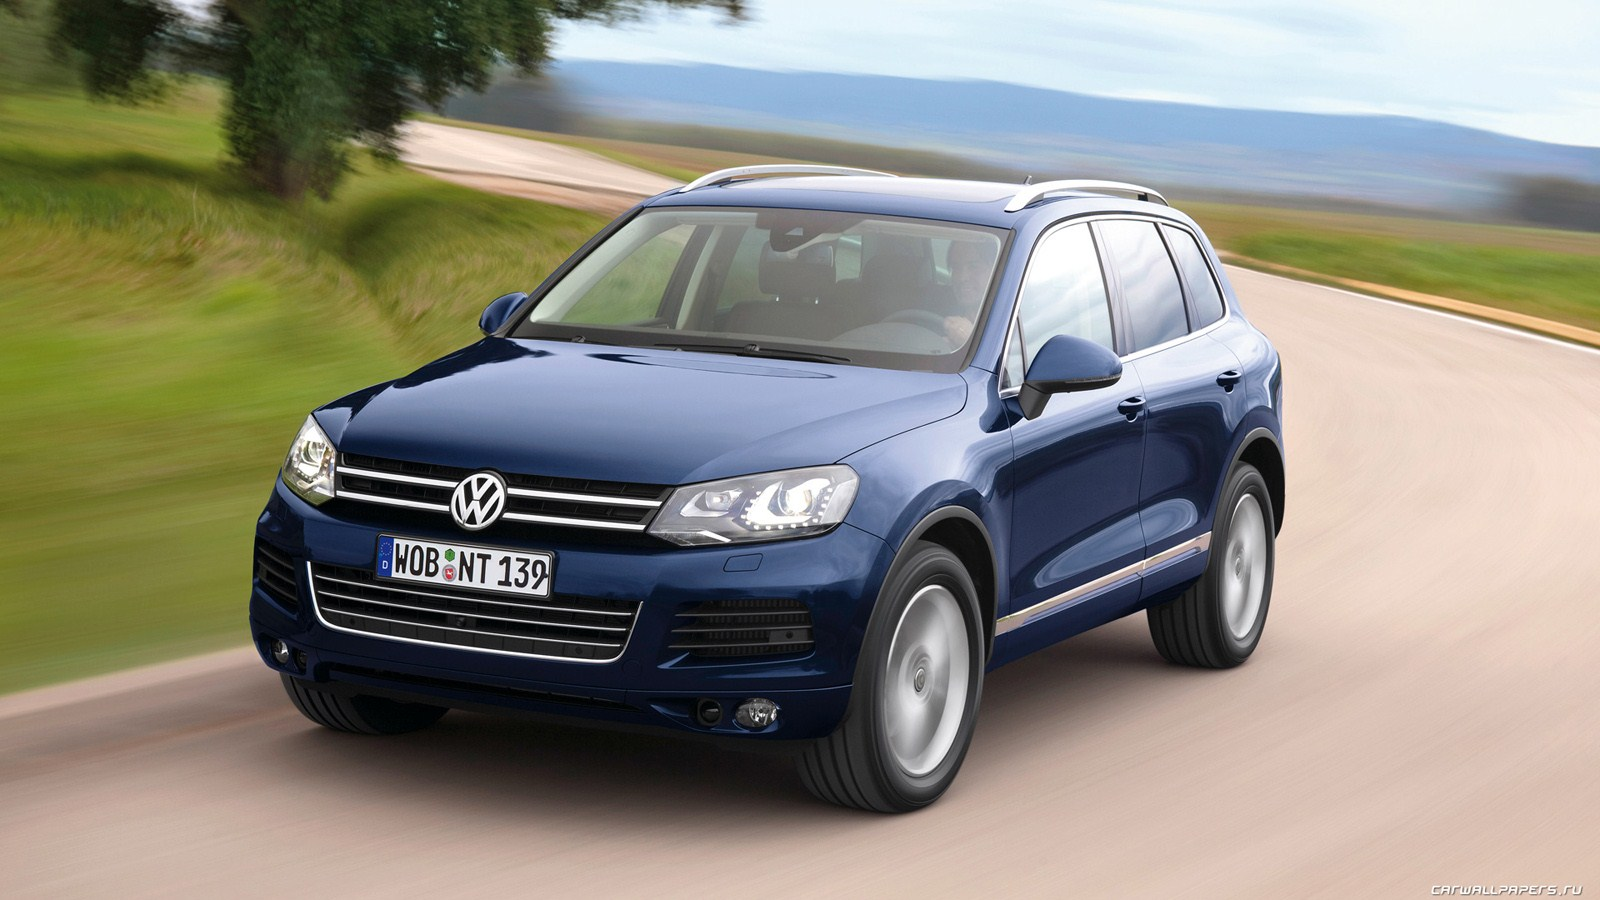 Volkswagen Touareg CC 2016 | 2017 - 2018 Cars News